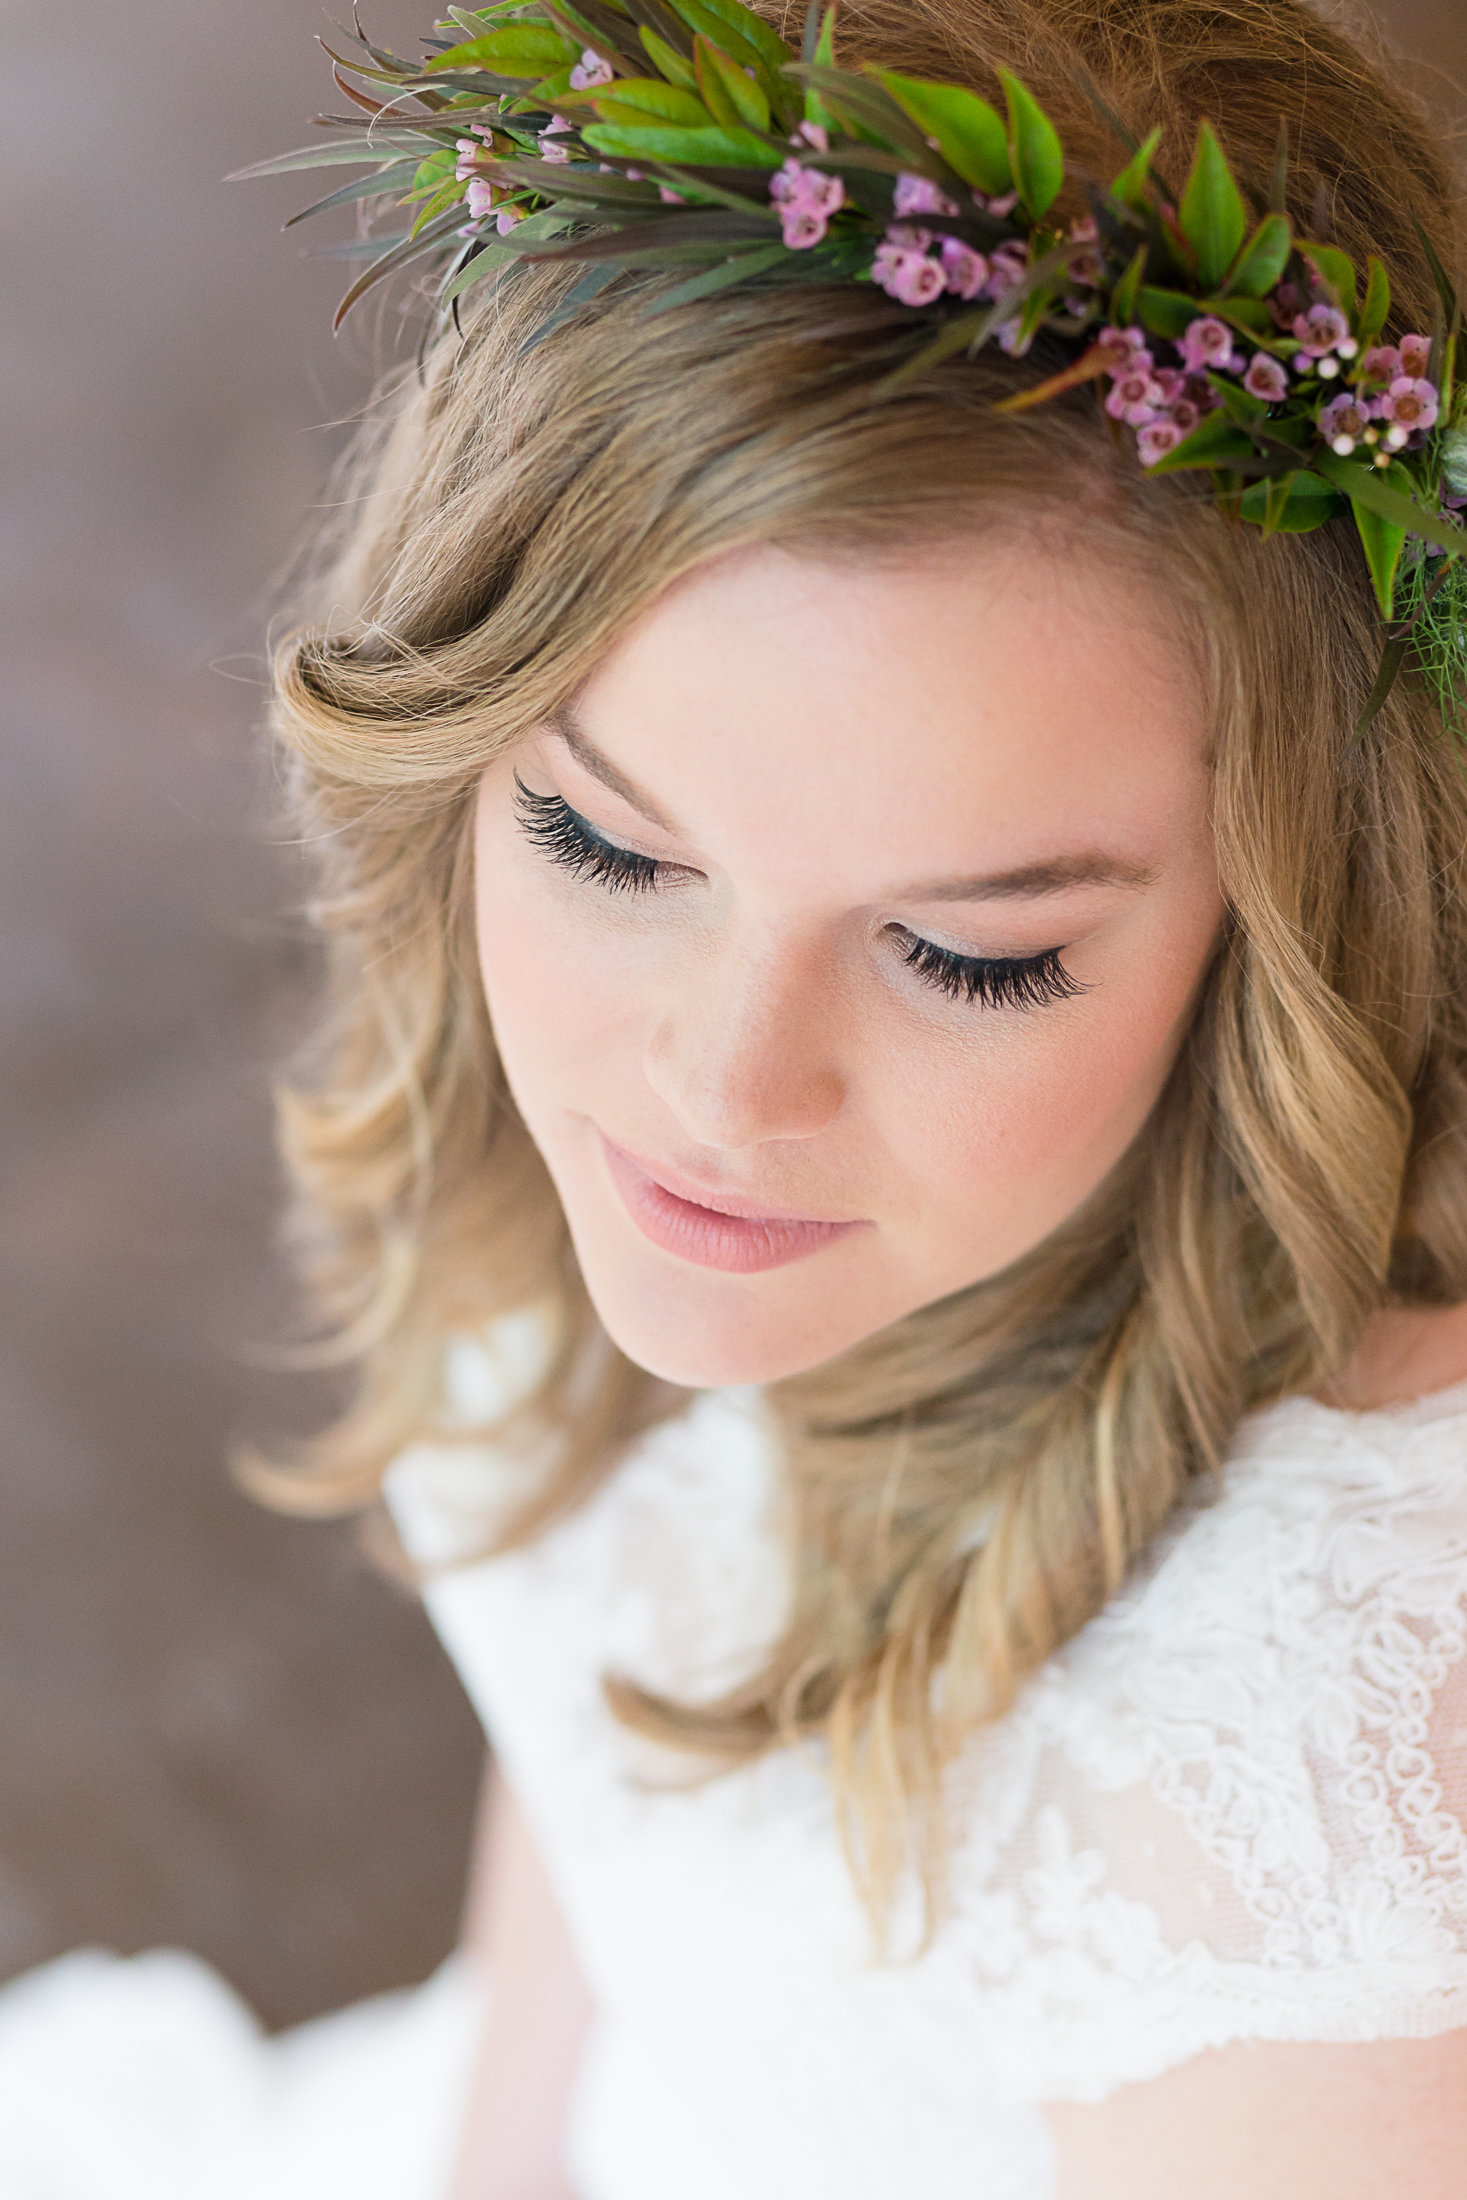 lyons-wedding-chris-loring-photography-22